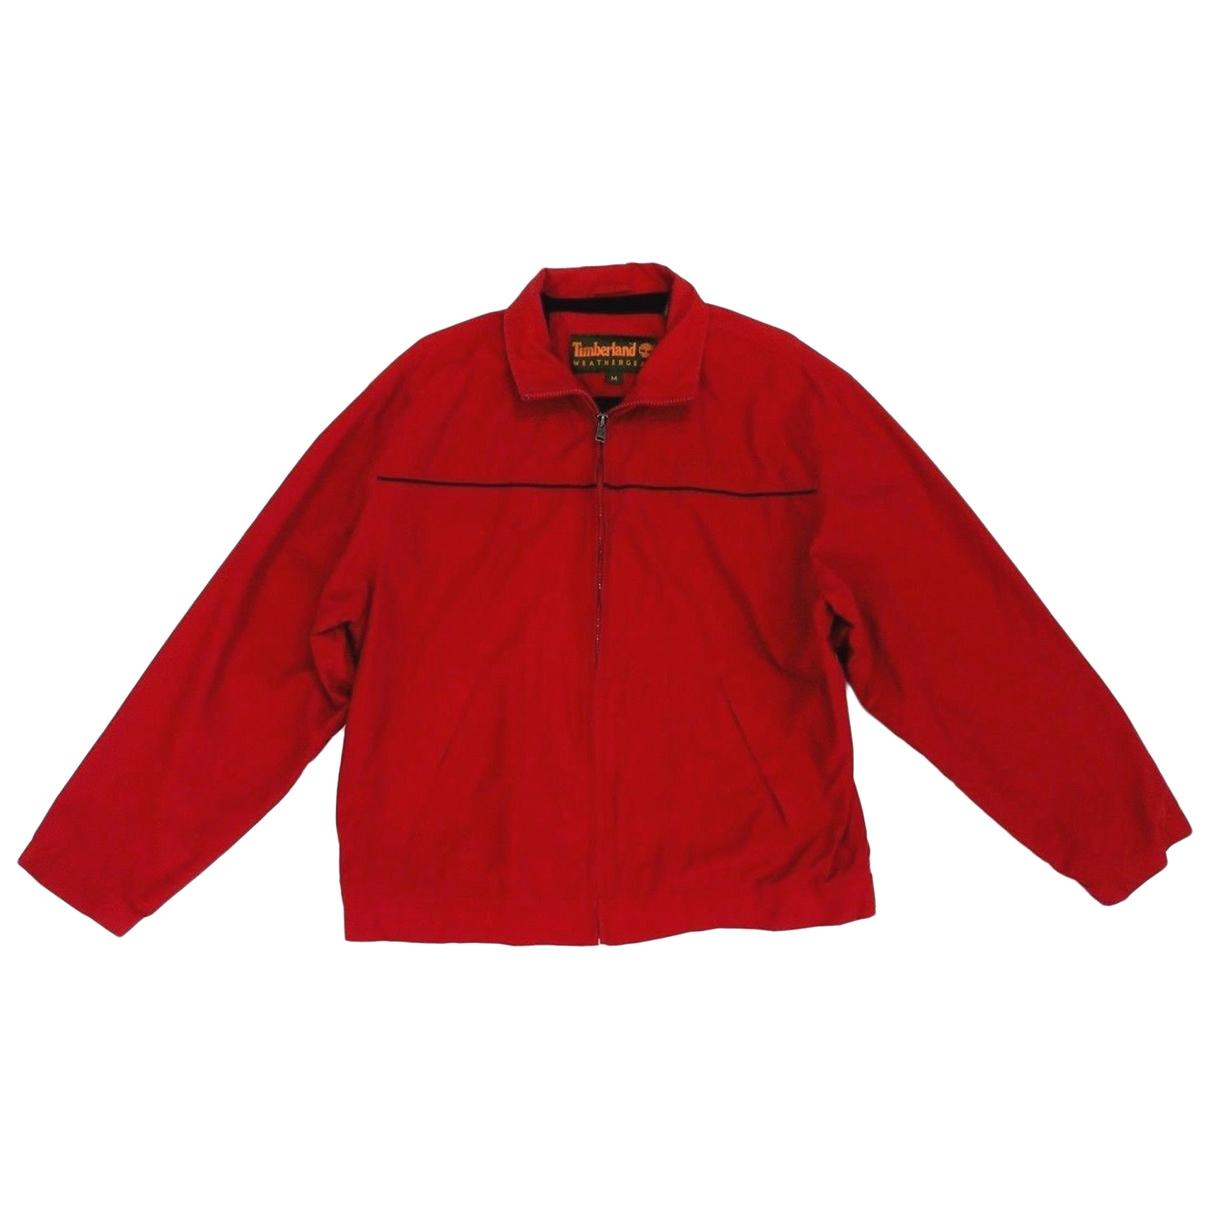 Timberland \N Red jacket for Women M International